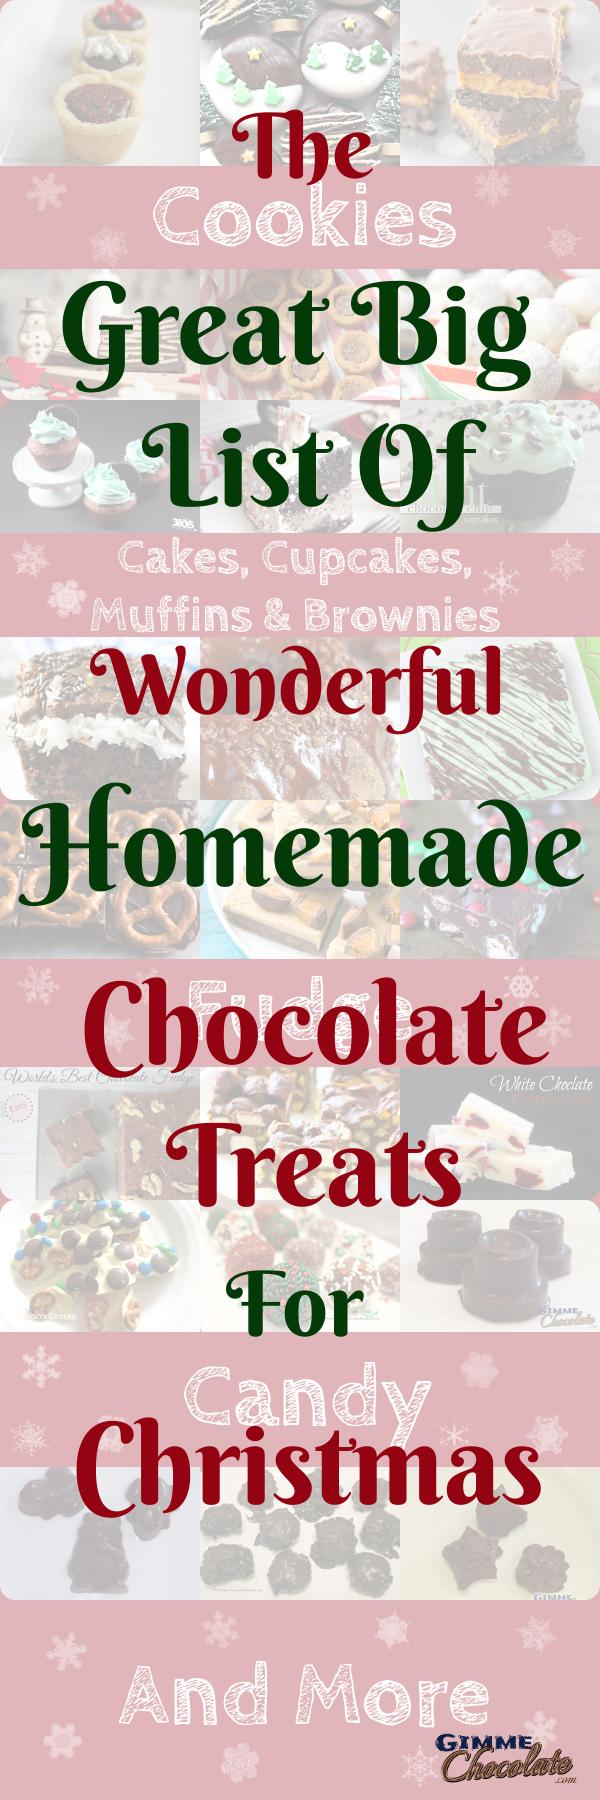 The Great Big List Of Wonderful Homemade Chocolate Treats For Christmas